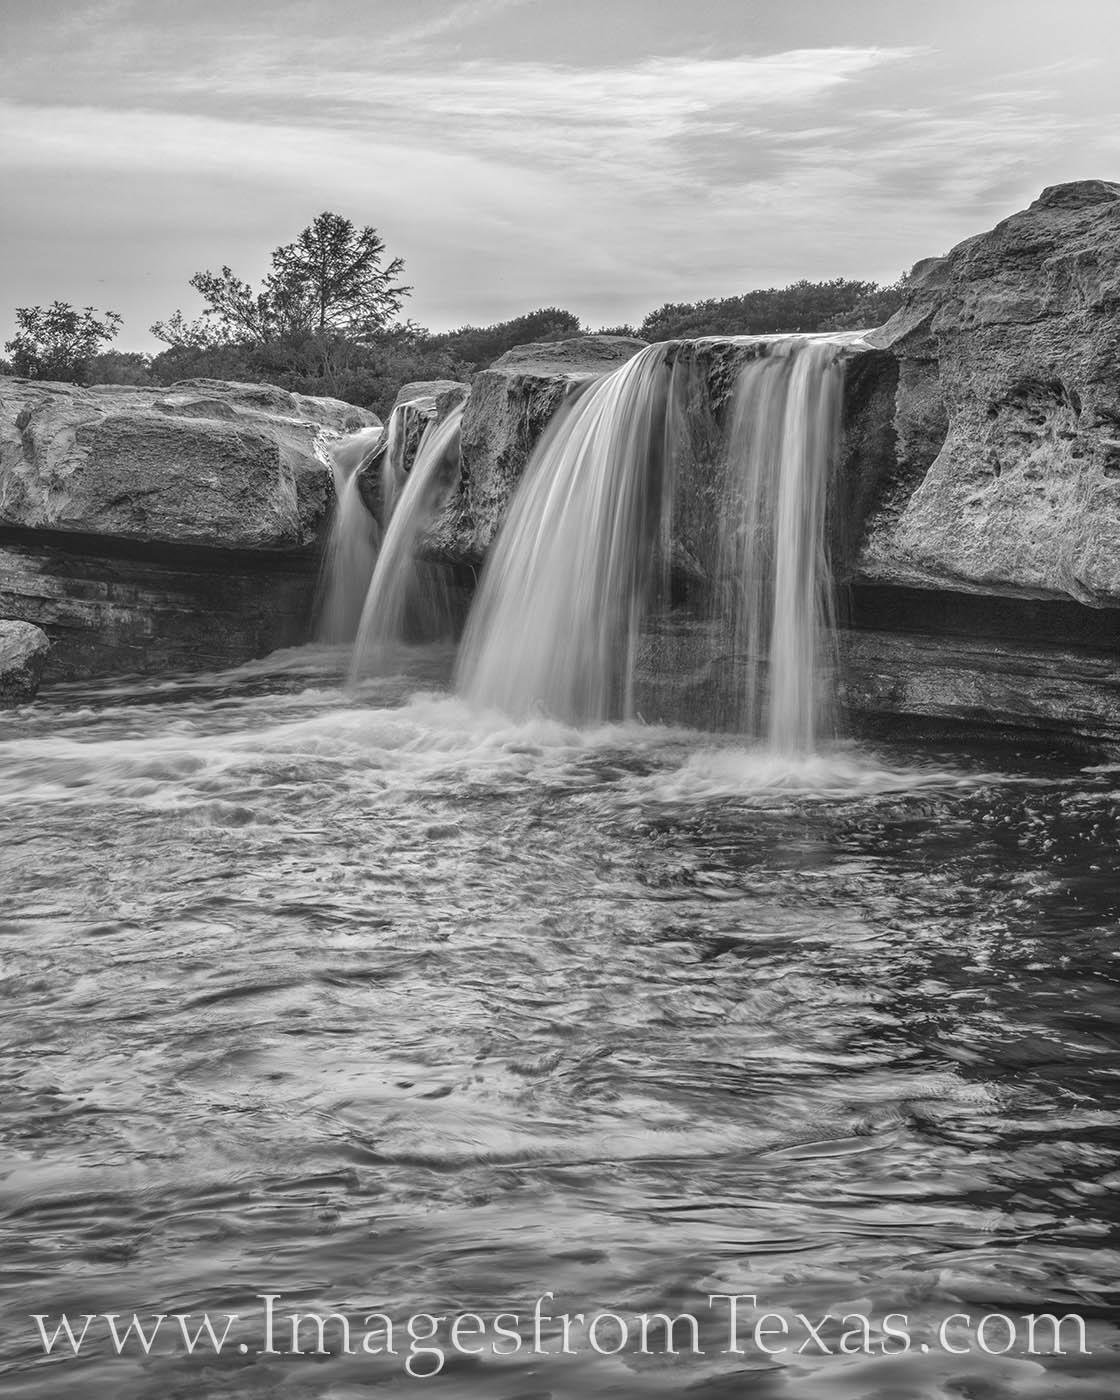 mckinney falls, austin texas, state park, waterfall, black and white, prints for sale, texas black and white, photo